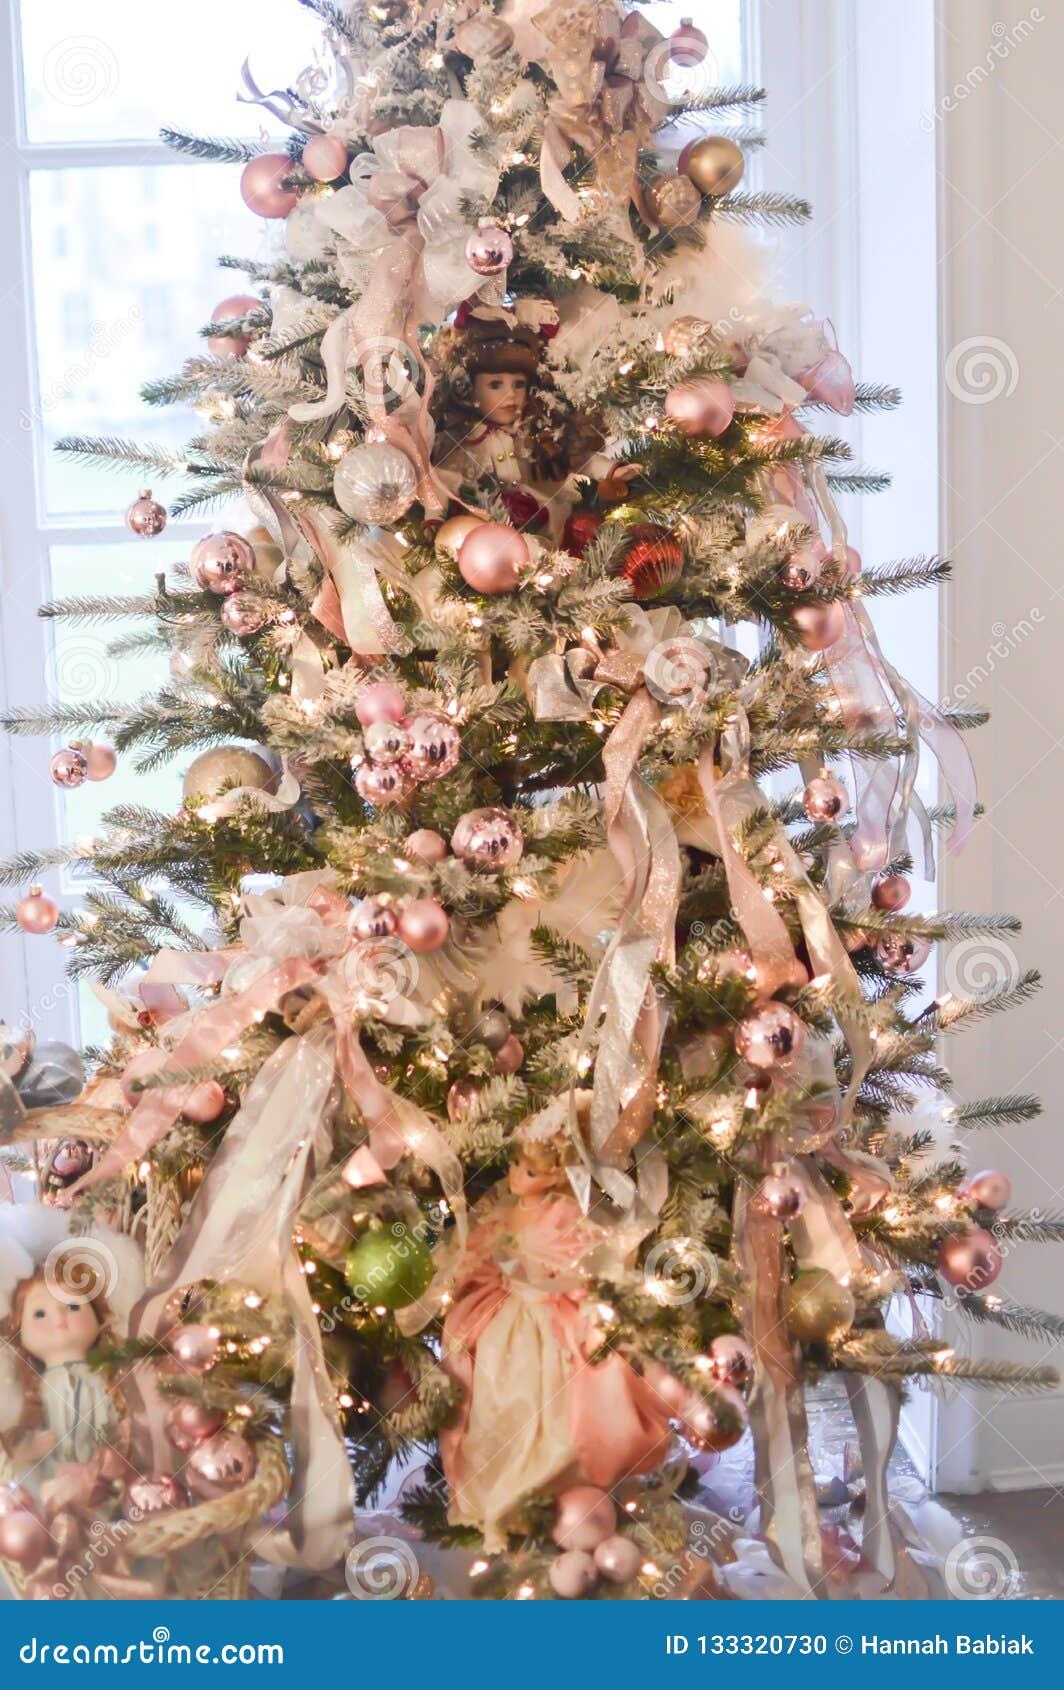 Christmas Tree With China Dolls Stock Photo Image Of Gift Toys 133320730